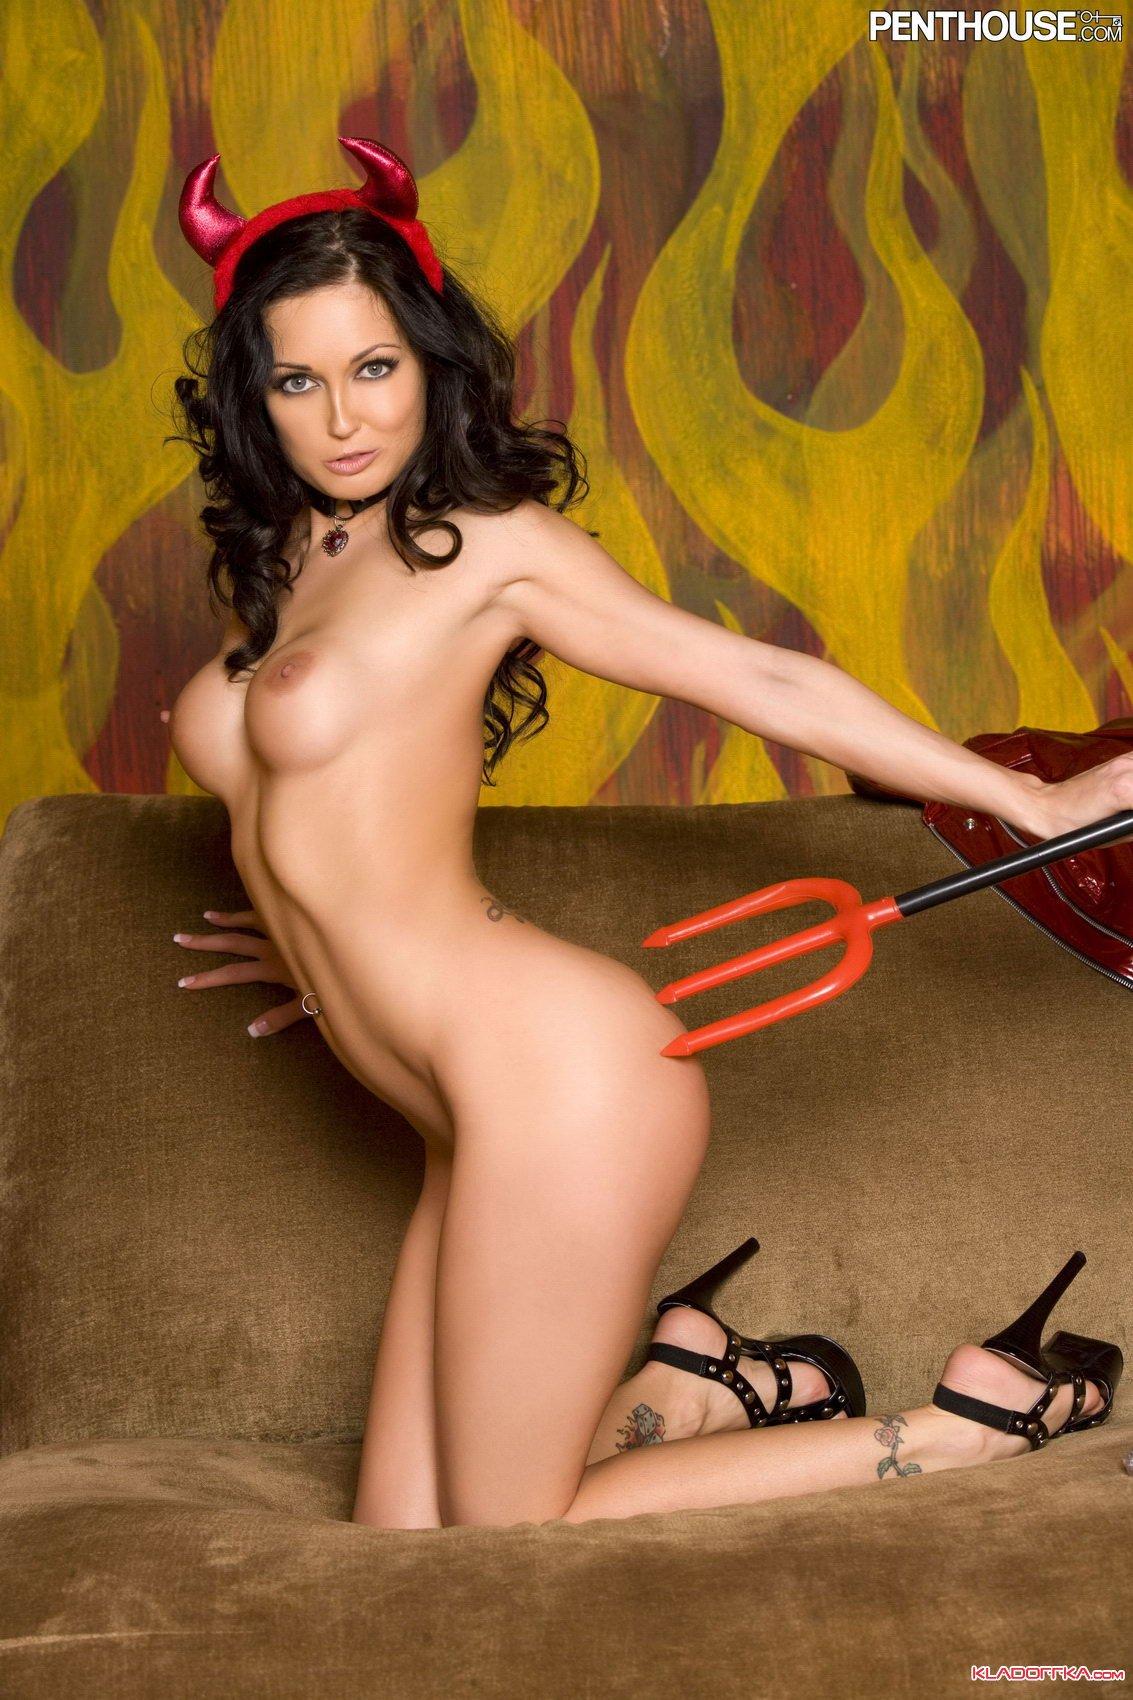 Голая порно актриса Melissa Jacobs смотреть онлайн 2 фото